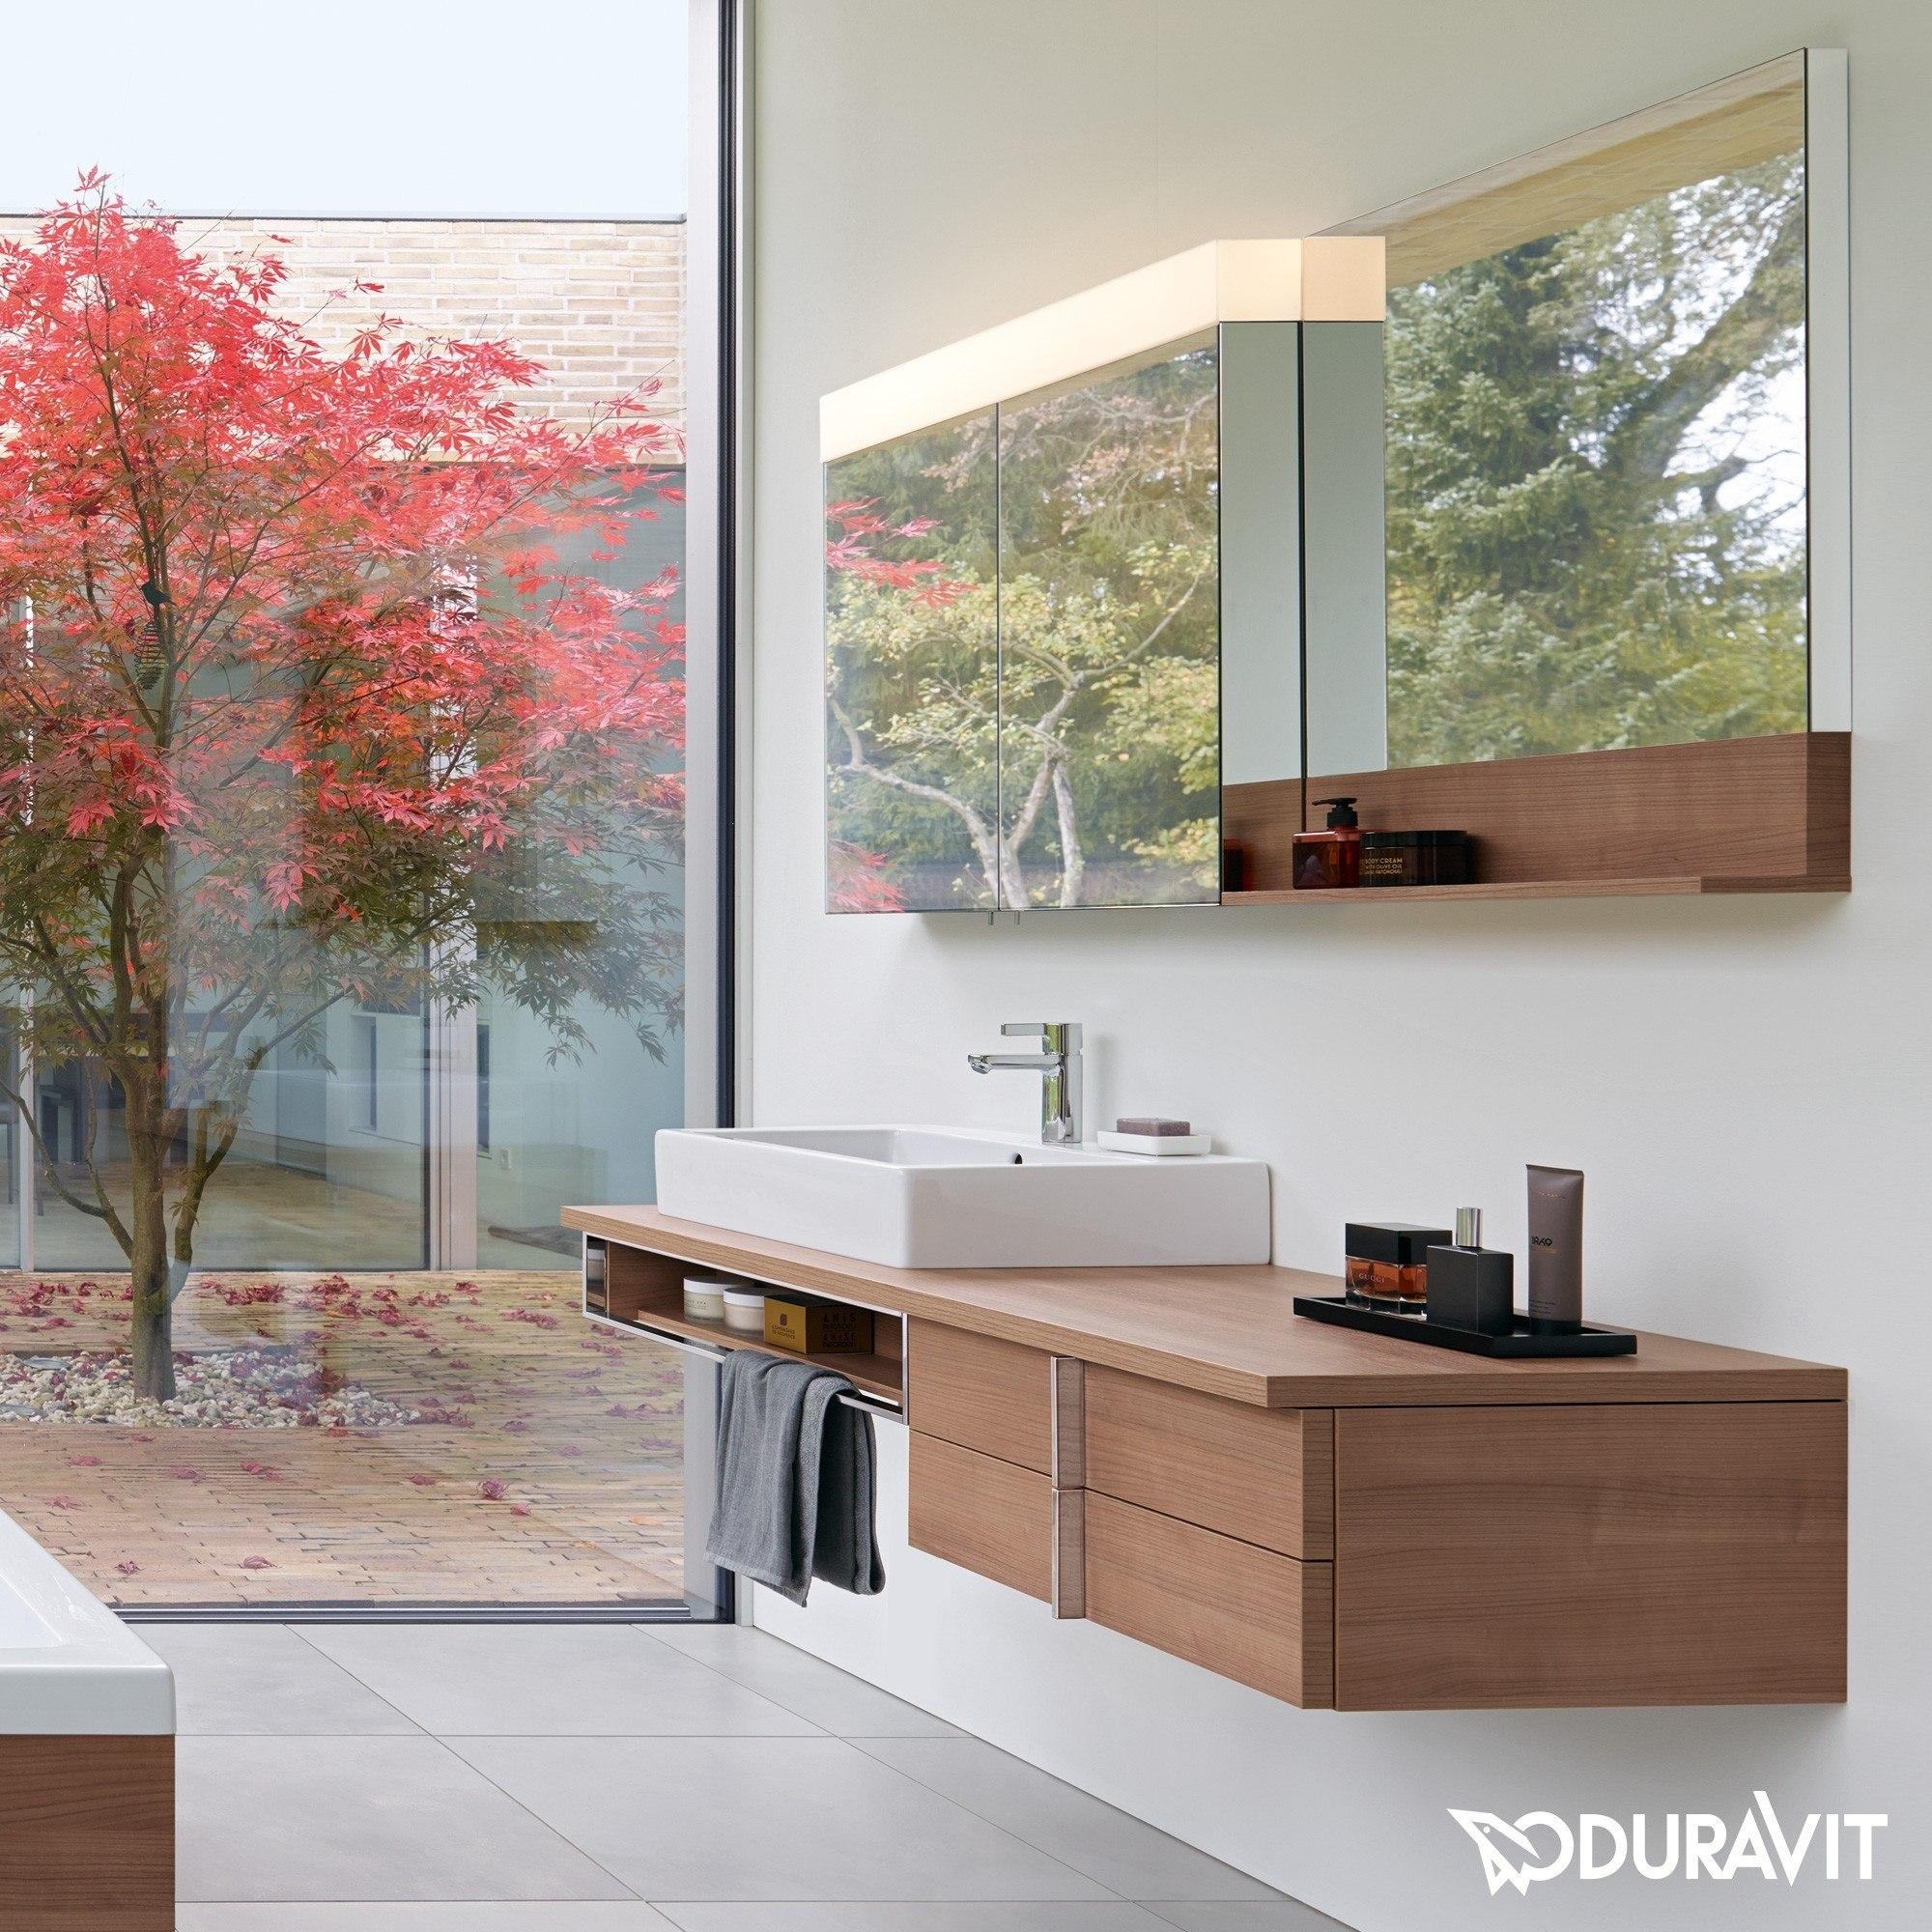 duravit ve750400000 vero 47 1 4 x 31 1 2 inch mirror cabinet. Black Bedroom Furniture Sets. Home Design Ideas